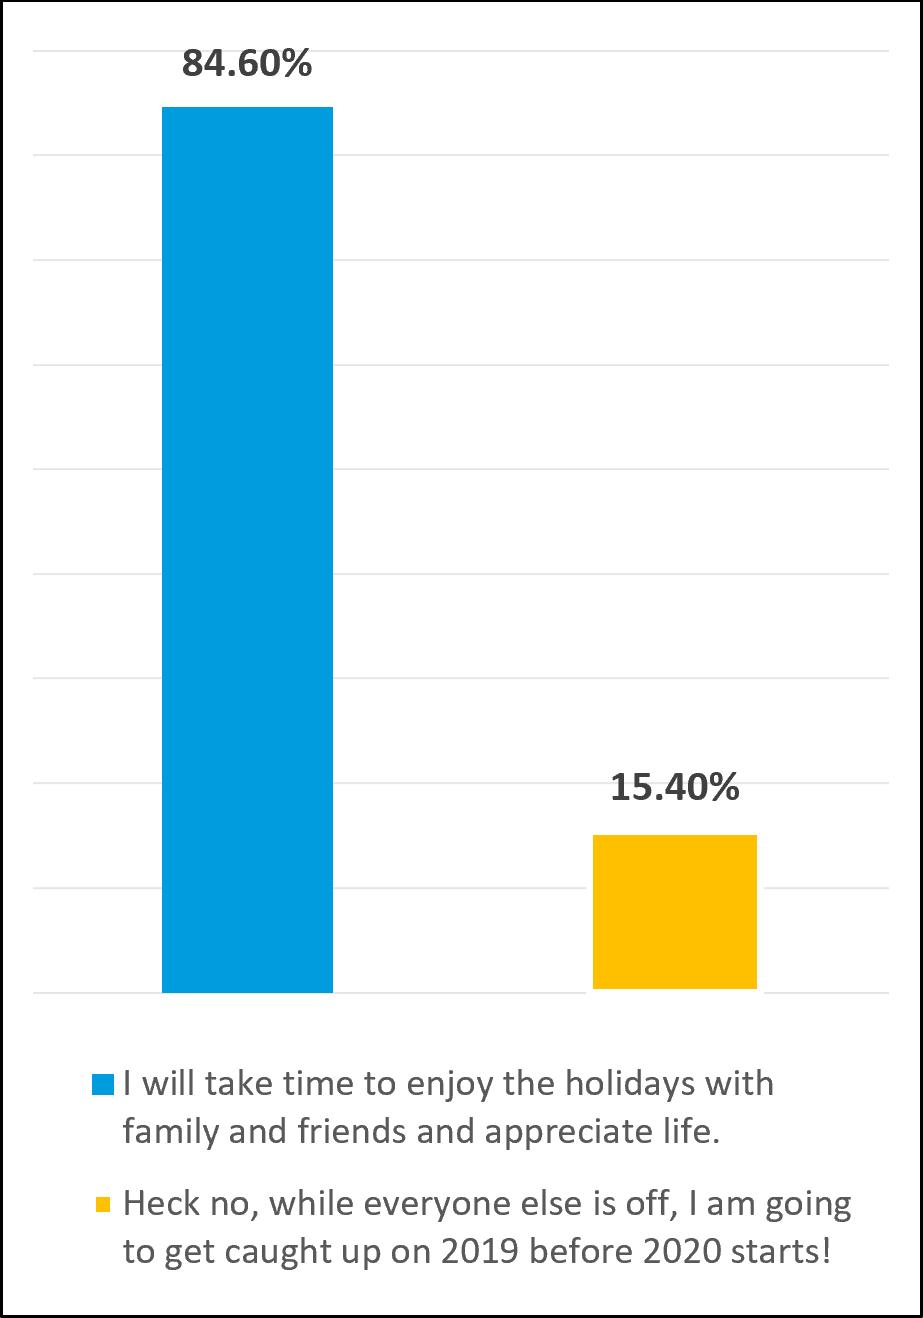 Oct 2019 survey results